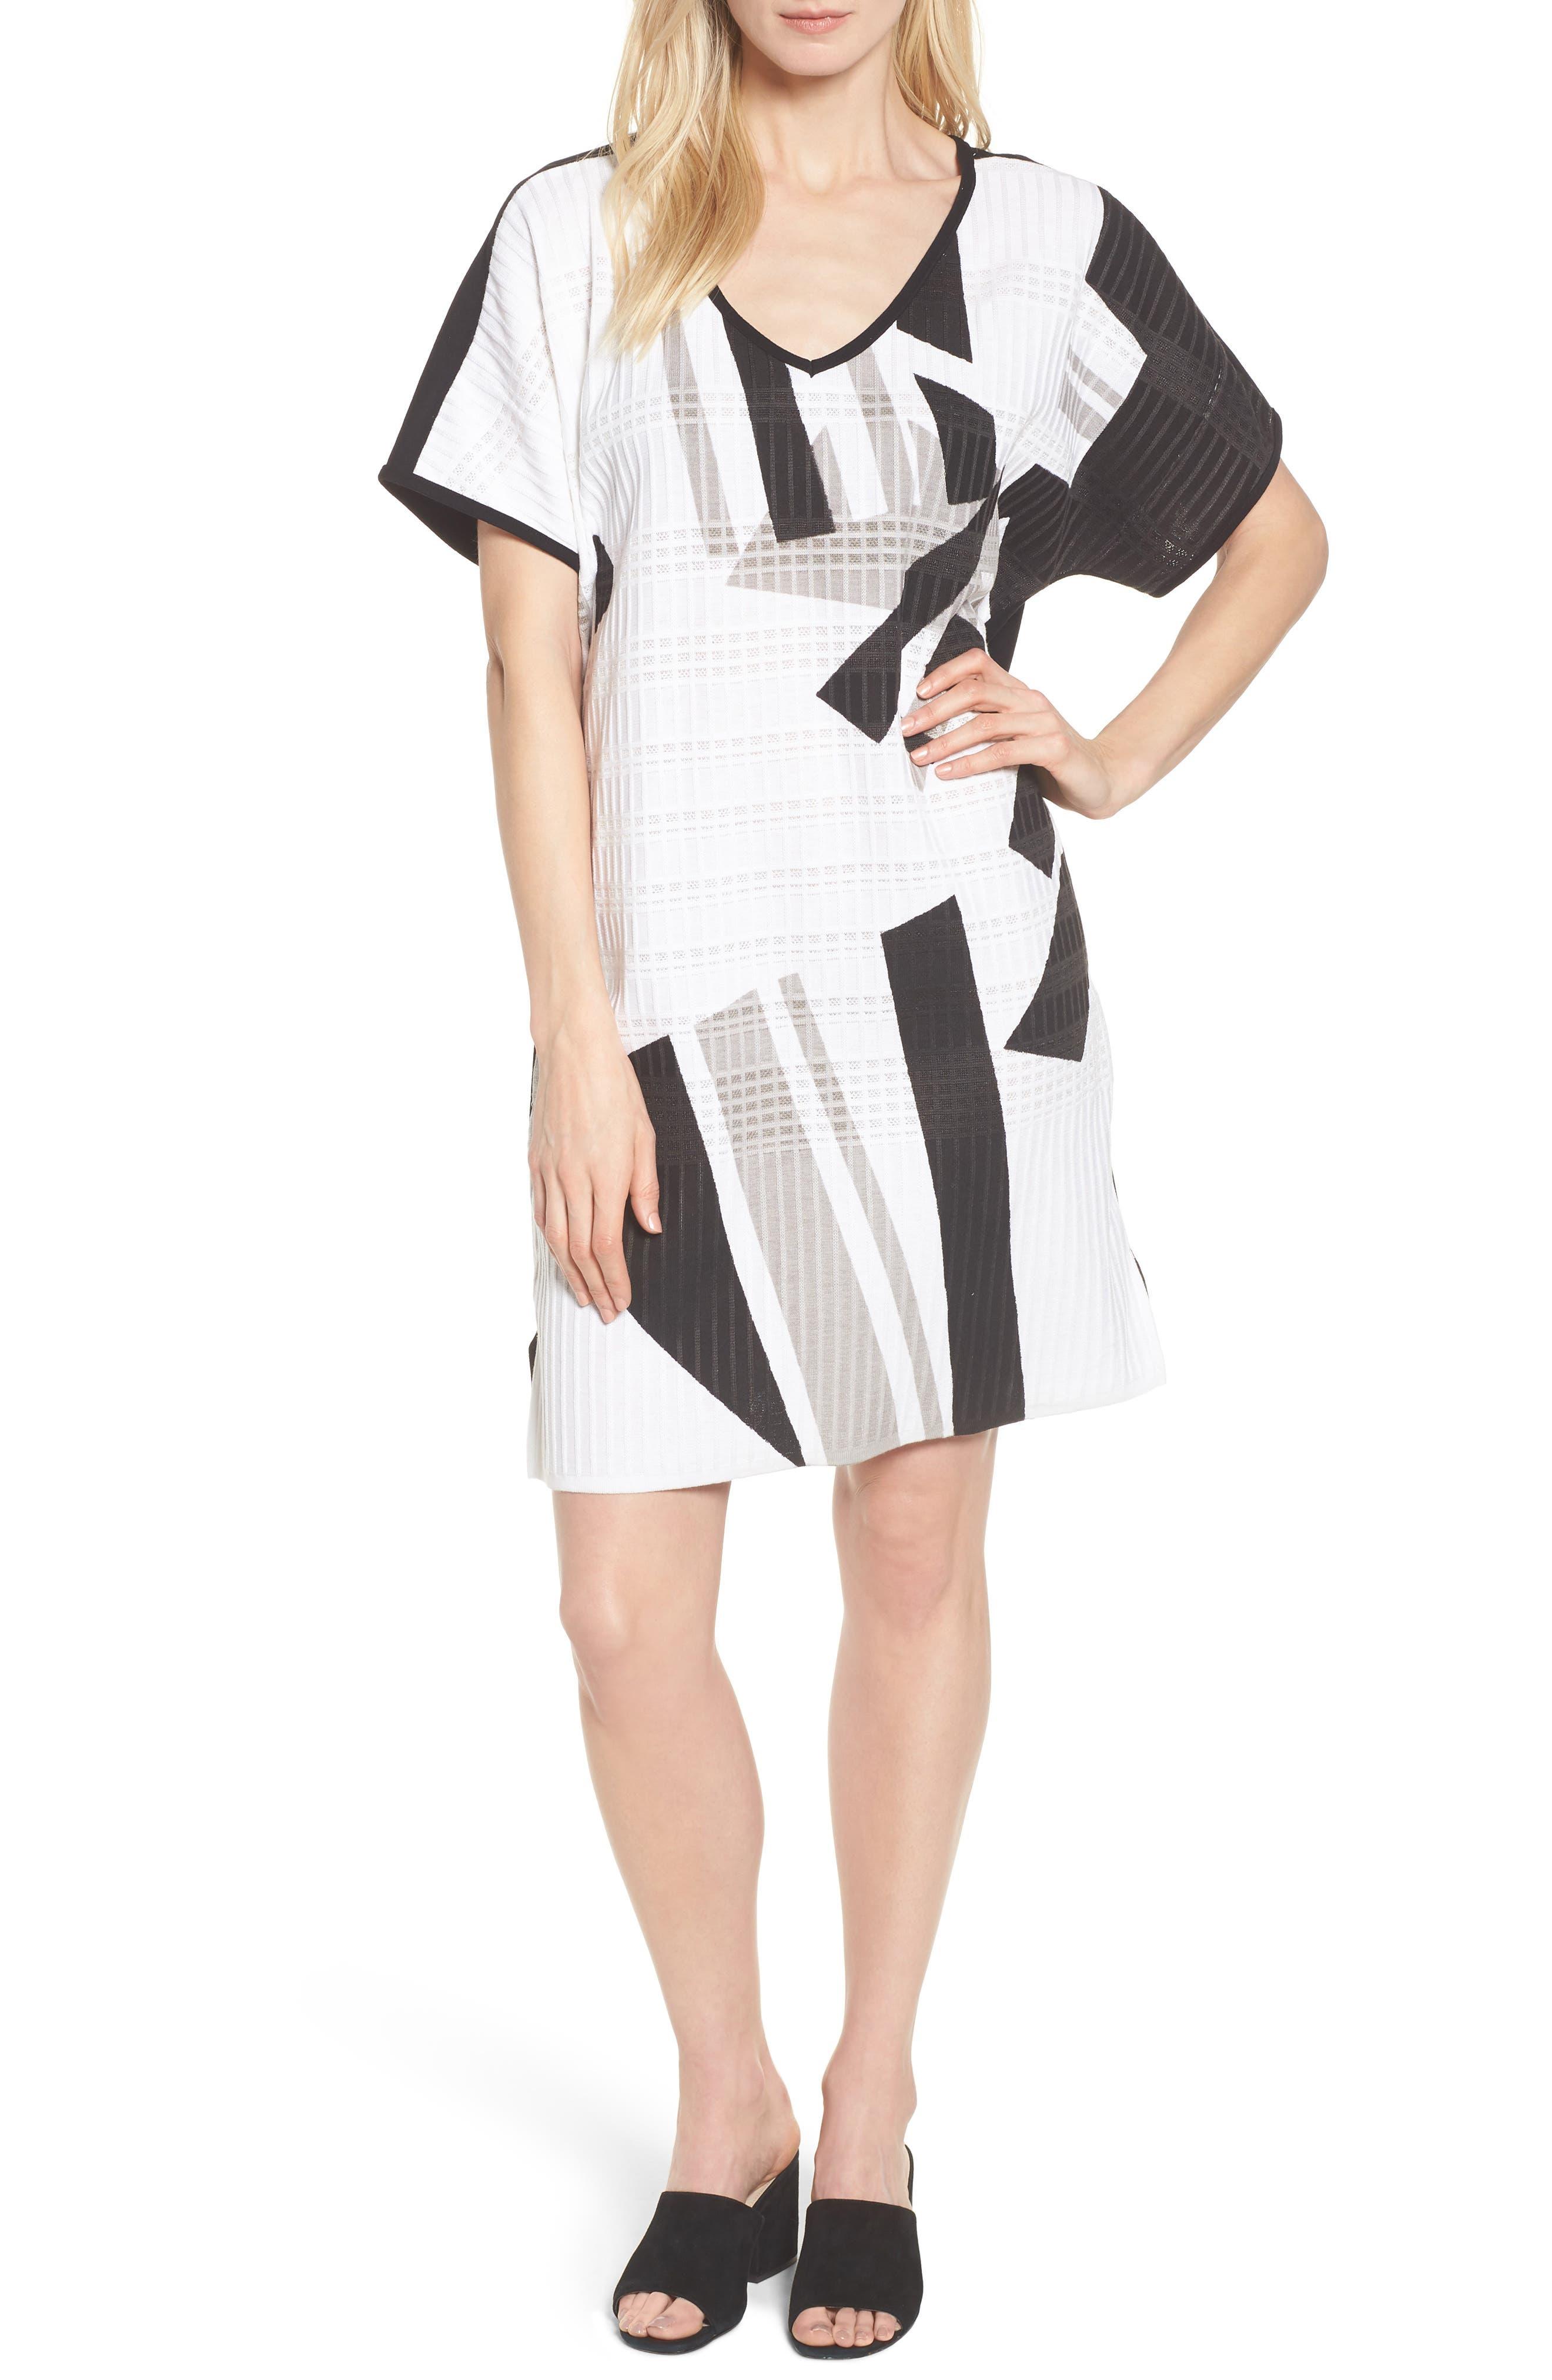 Geometric Jacquard Tunic Dress,                         Main,                         color, White/ Almond Beige/ Black